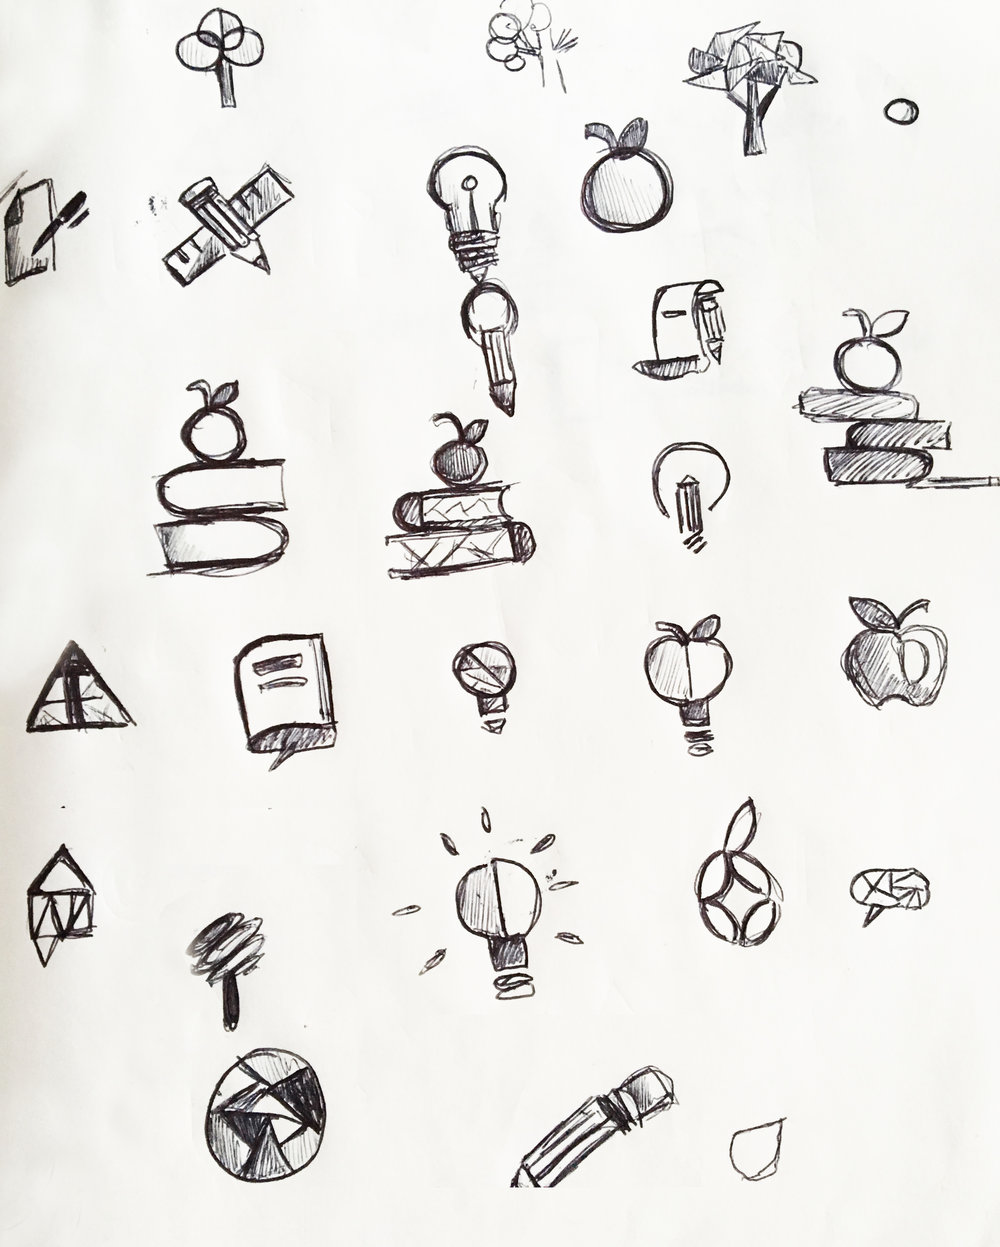 KS_drawing_02.jpg